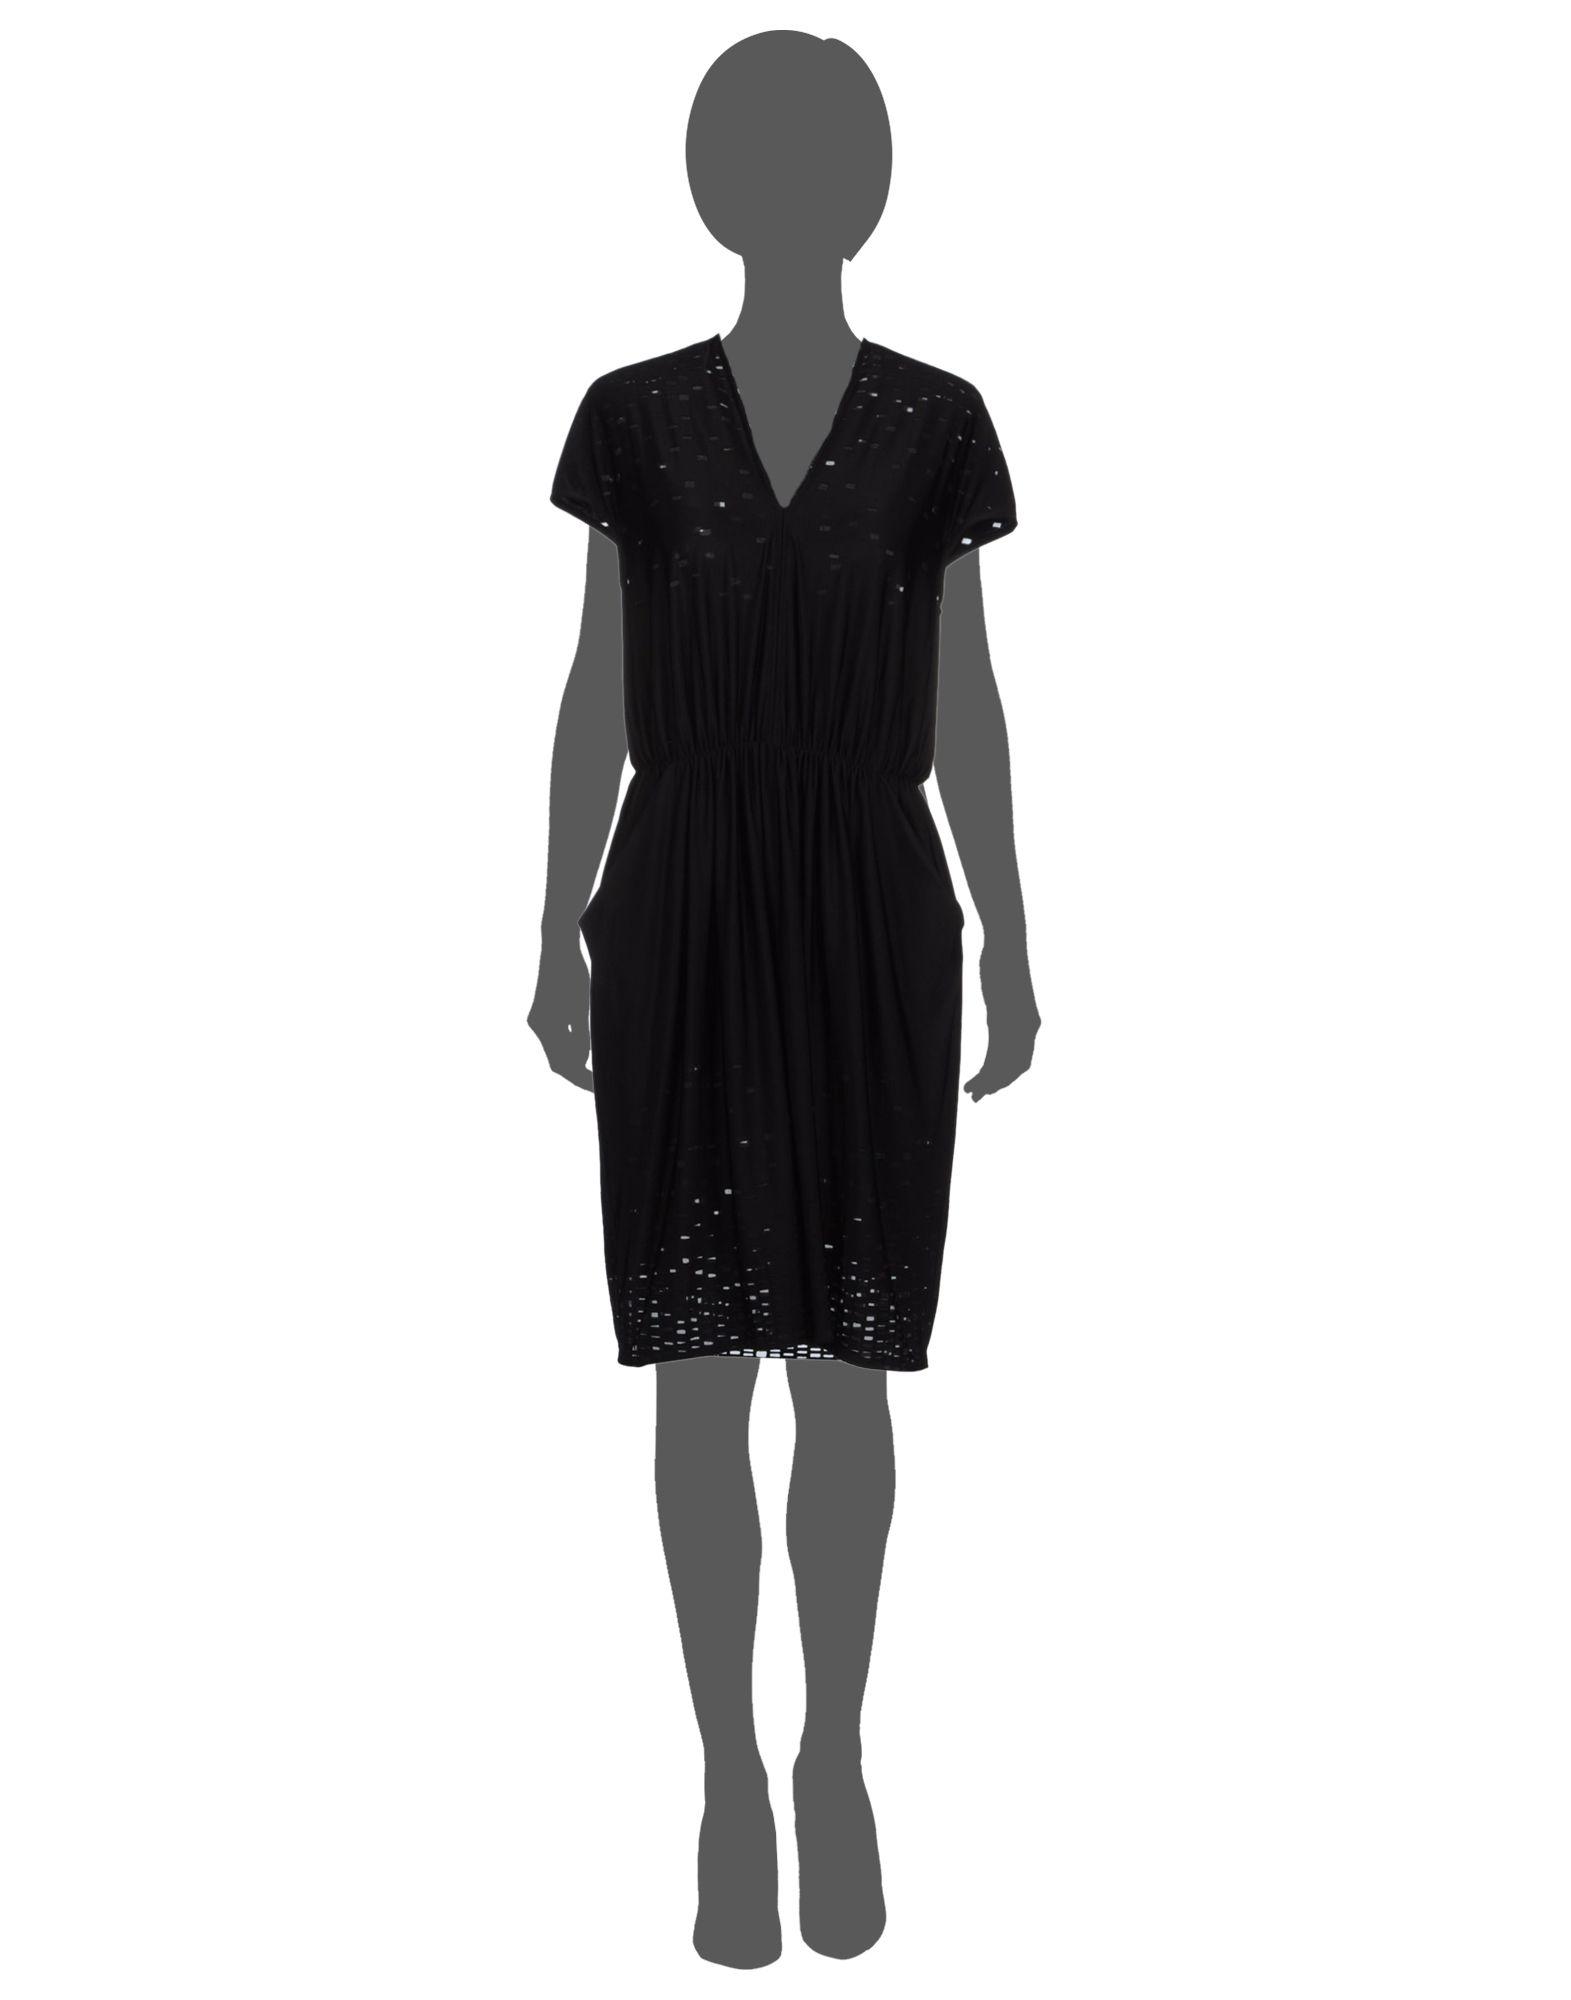 Maxime simoens dresses